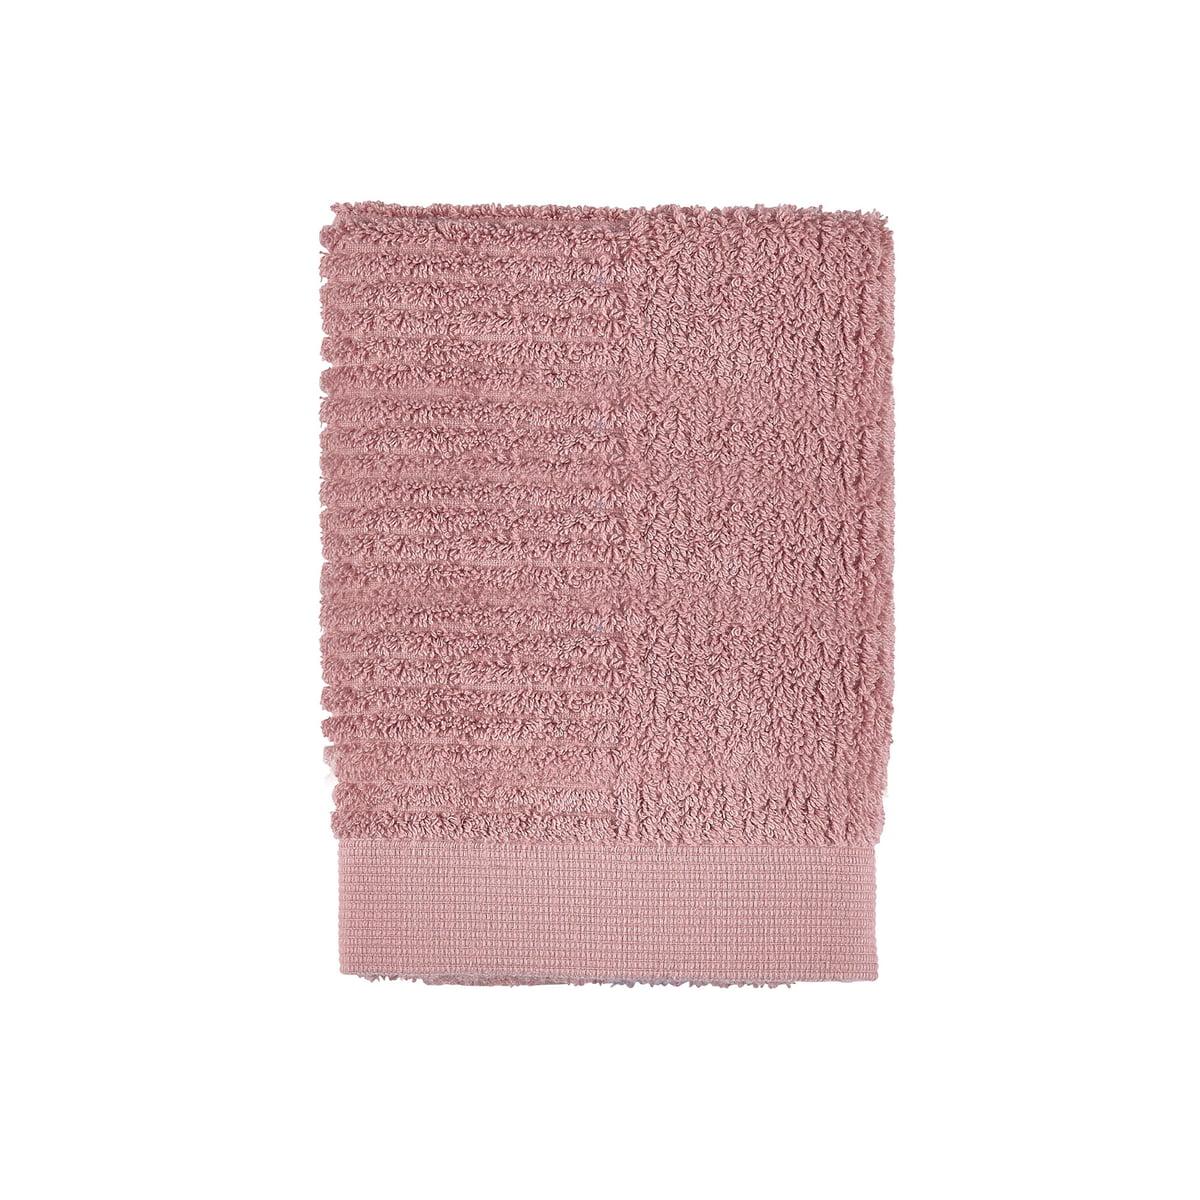 Zone Denmark - Classic Gästehandtuch, 50 x 70 cm, rose   Bad > Handtücher > Gästehandtücher   Zone Denmark